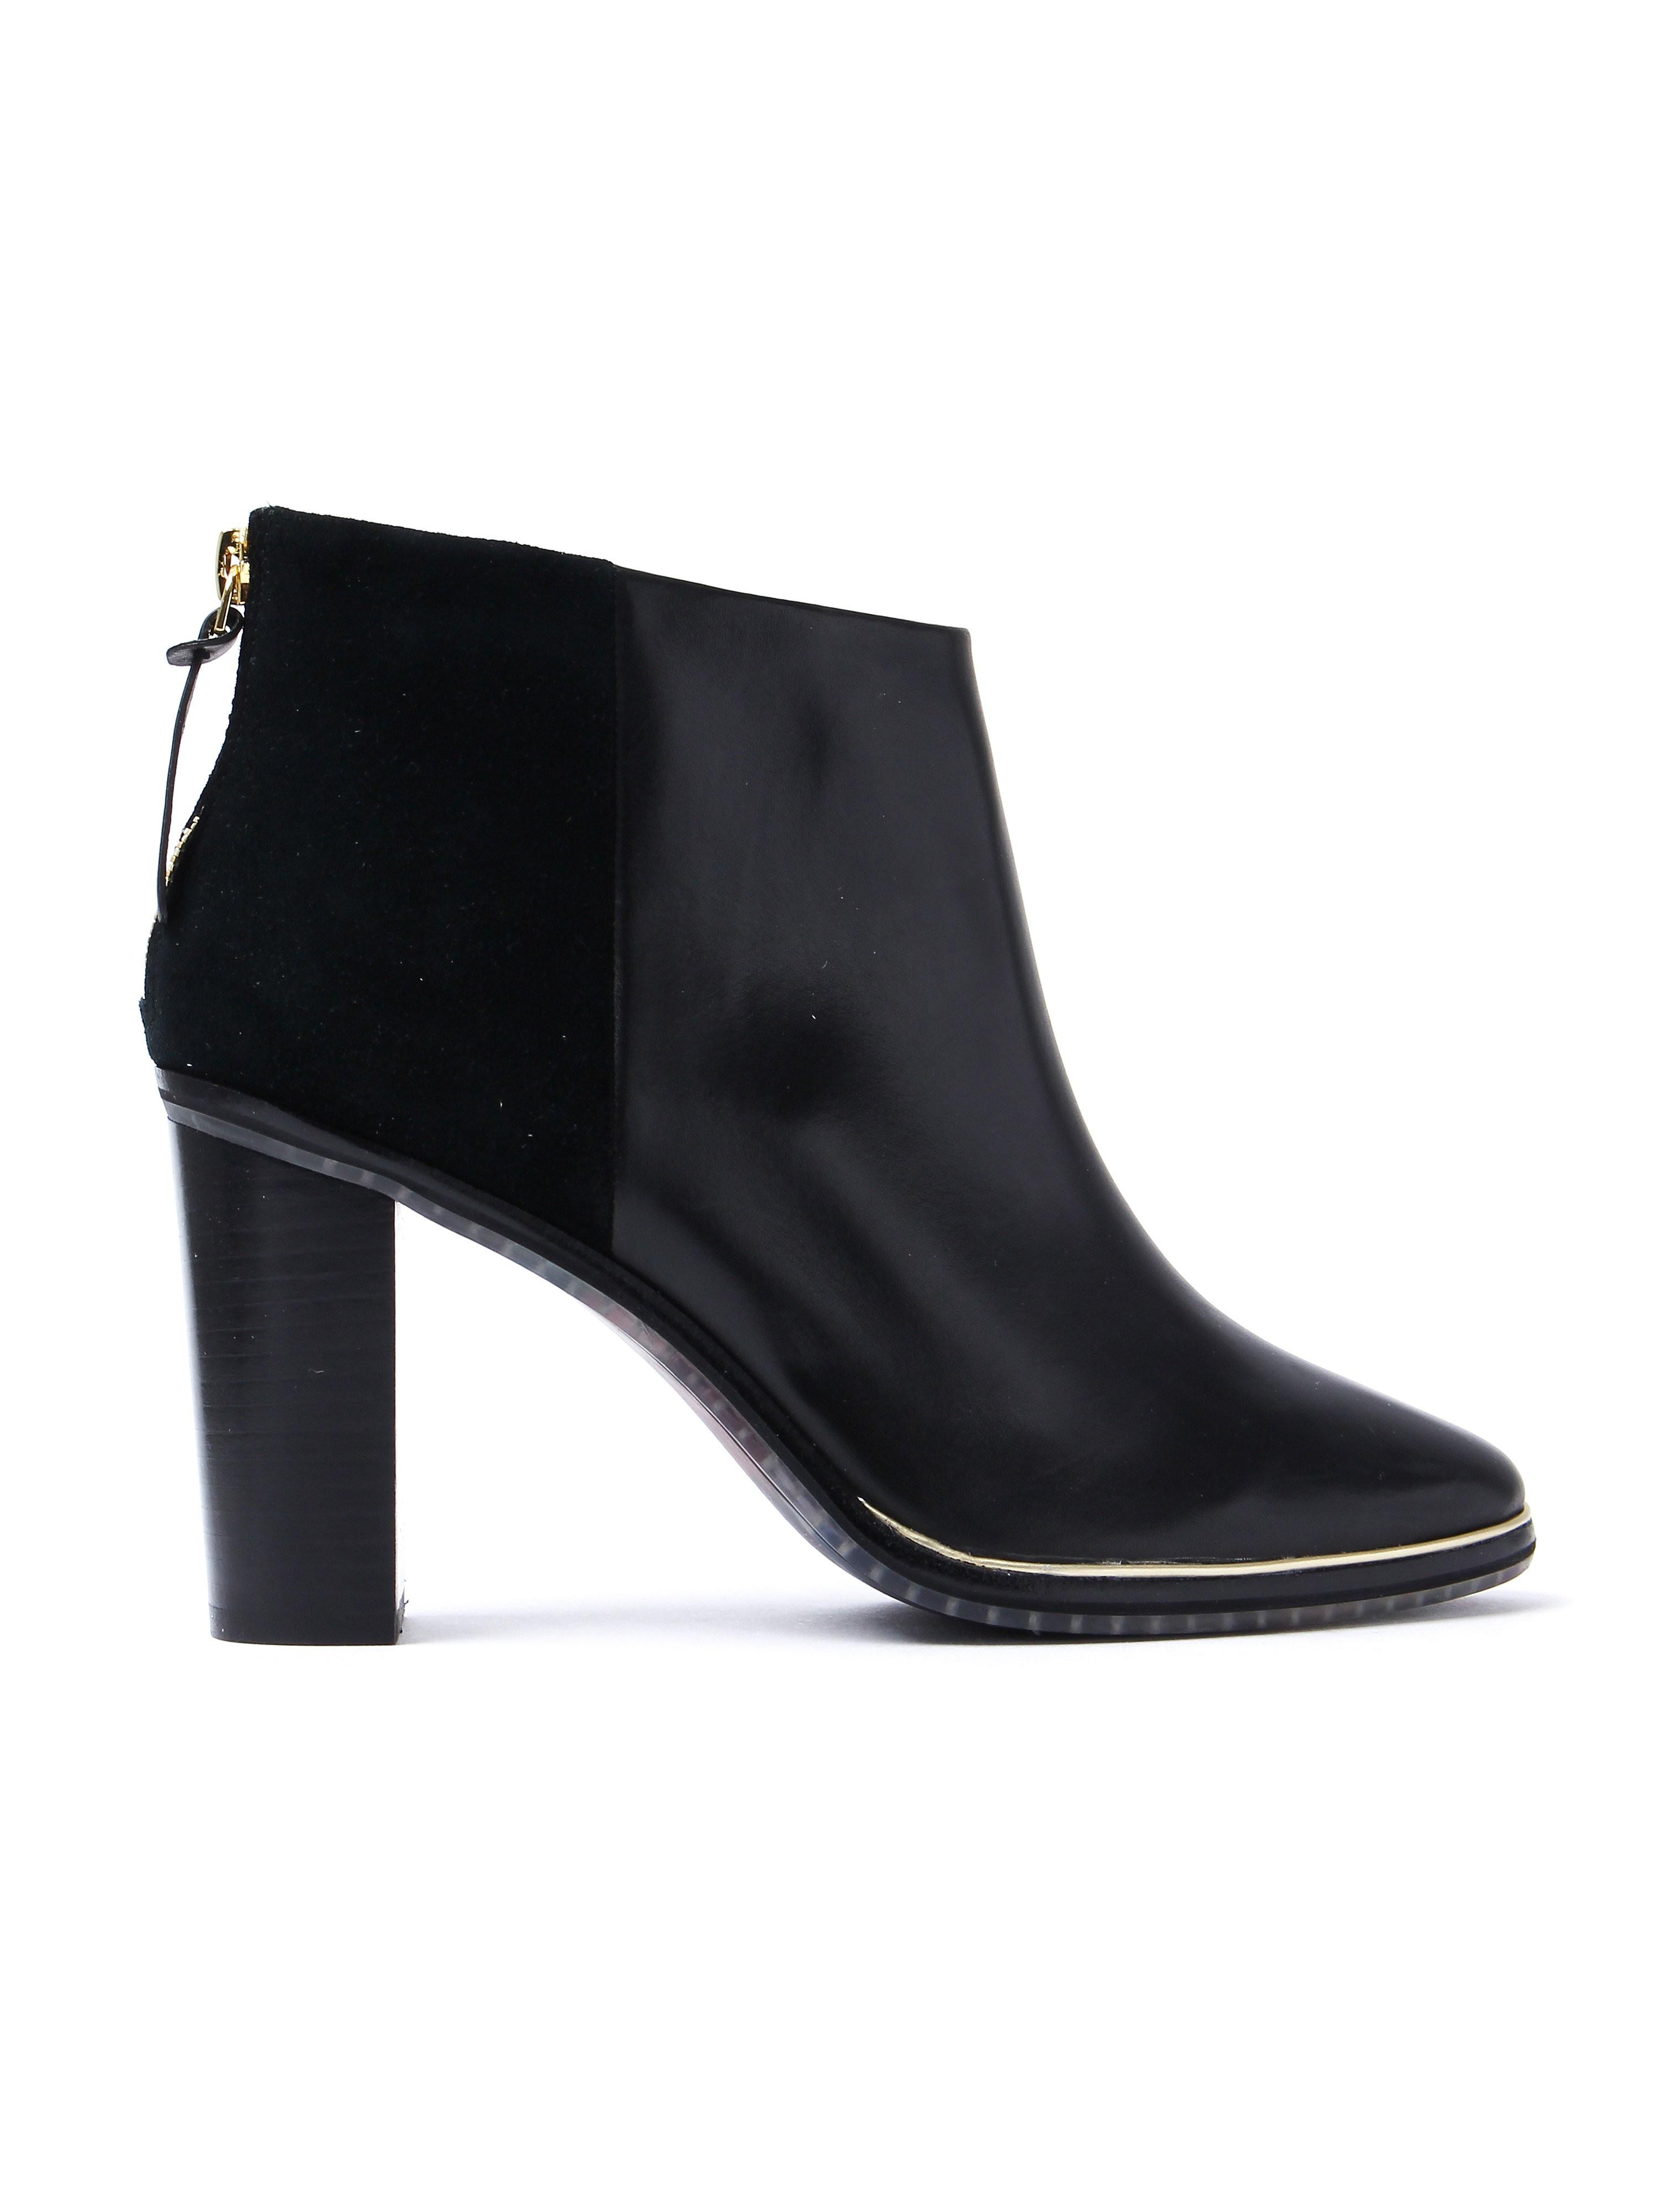 Ted Baker Women's Azalia Boots - Black Leather Suede